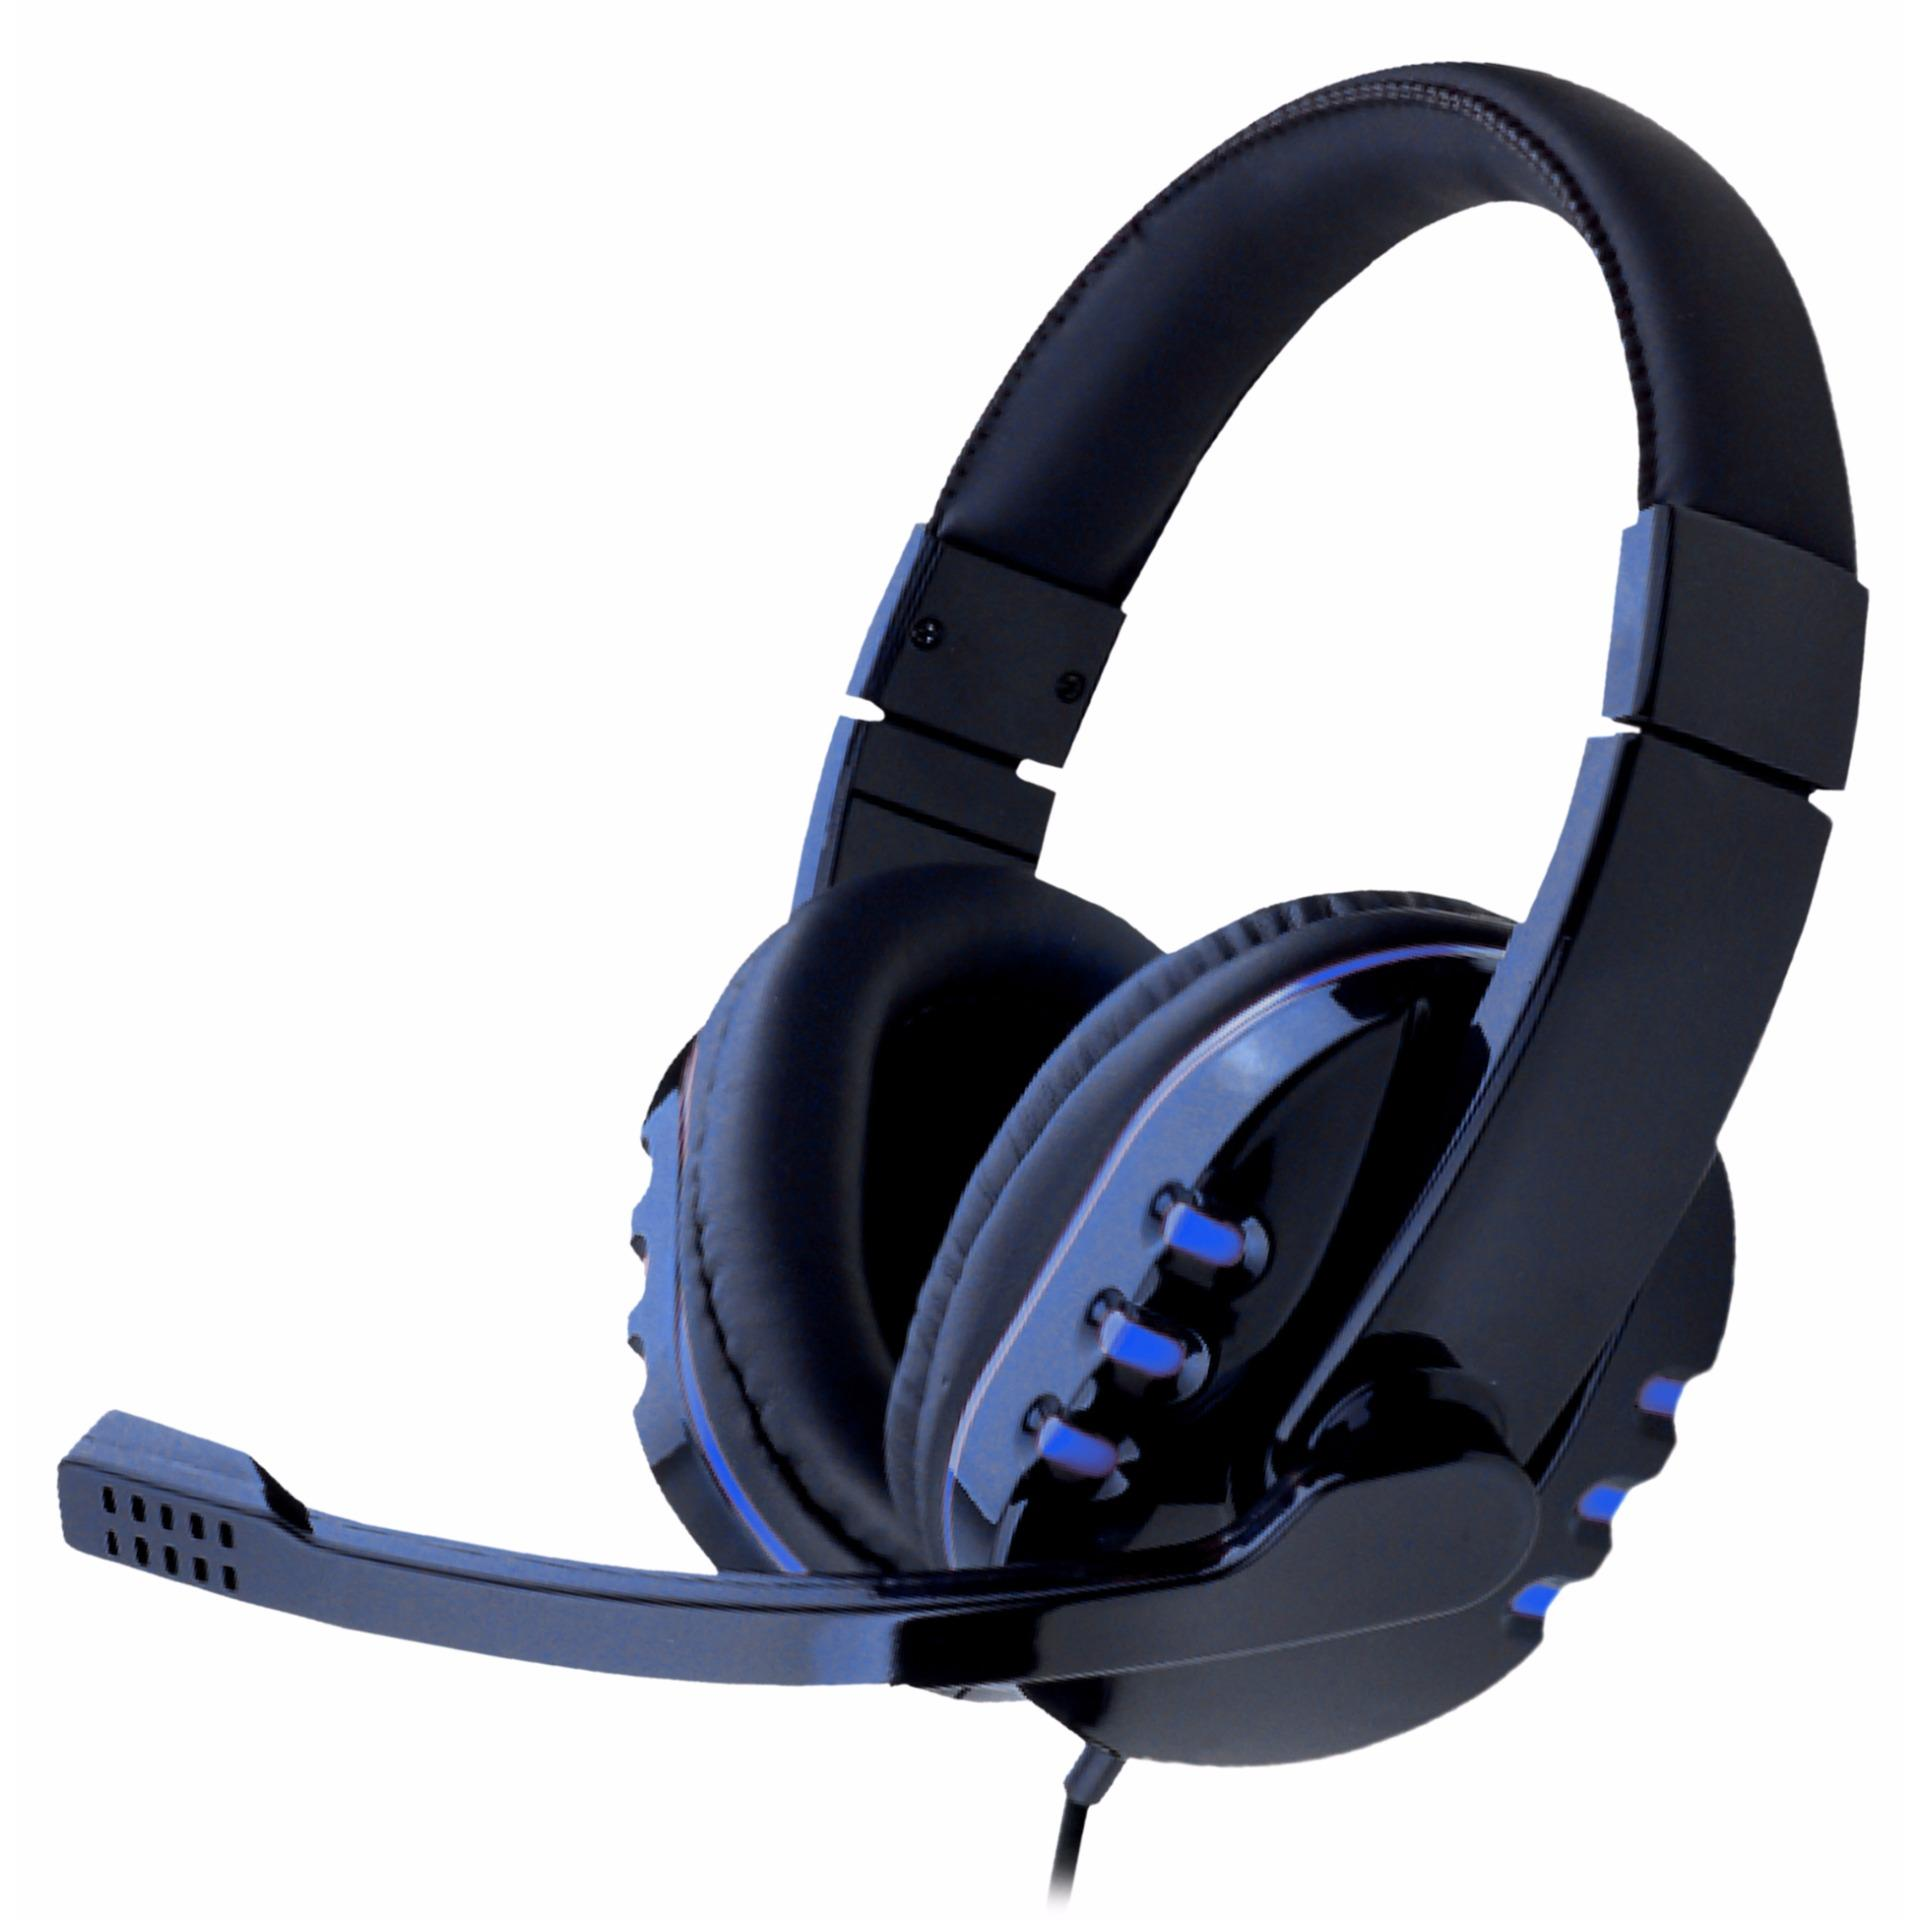 Mediatech Gaming Headset Headphone Zeus Msh 016 Biru Mediatech Diskon 40